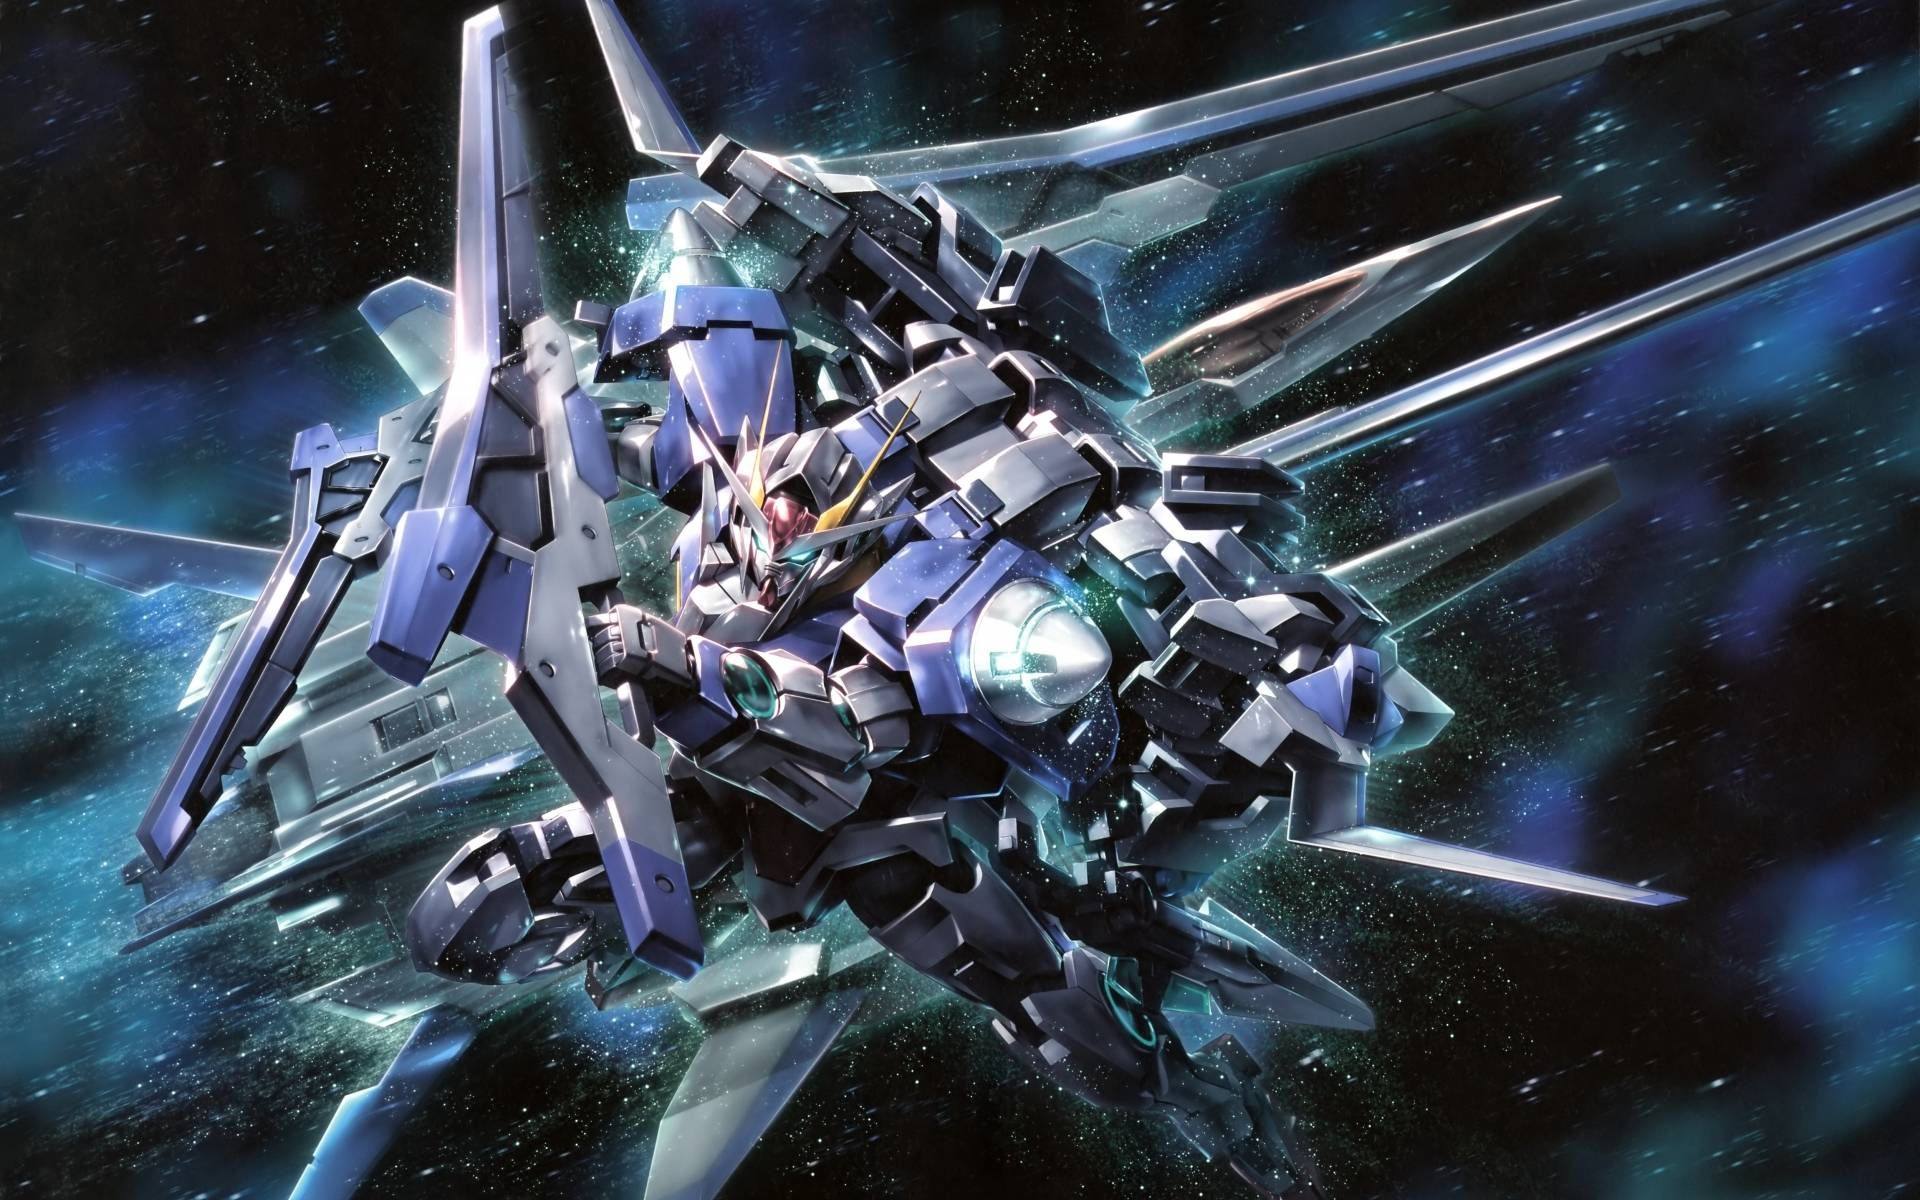 Gundam 00 Wallpapers Full Hd Wallpaper Search Gundam Wallpapers Gundam Art Gundam 00